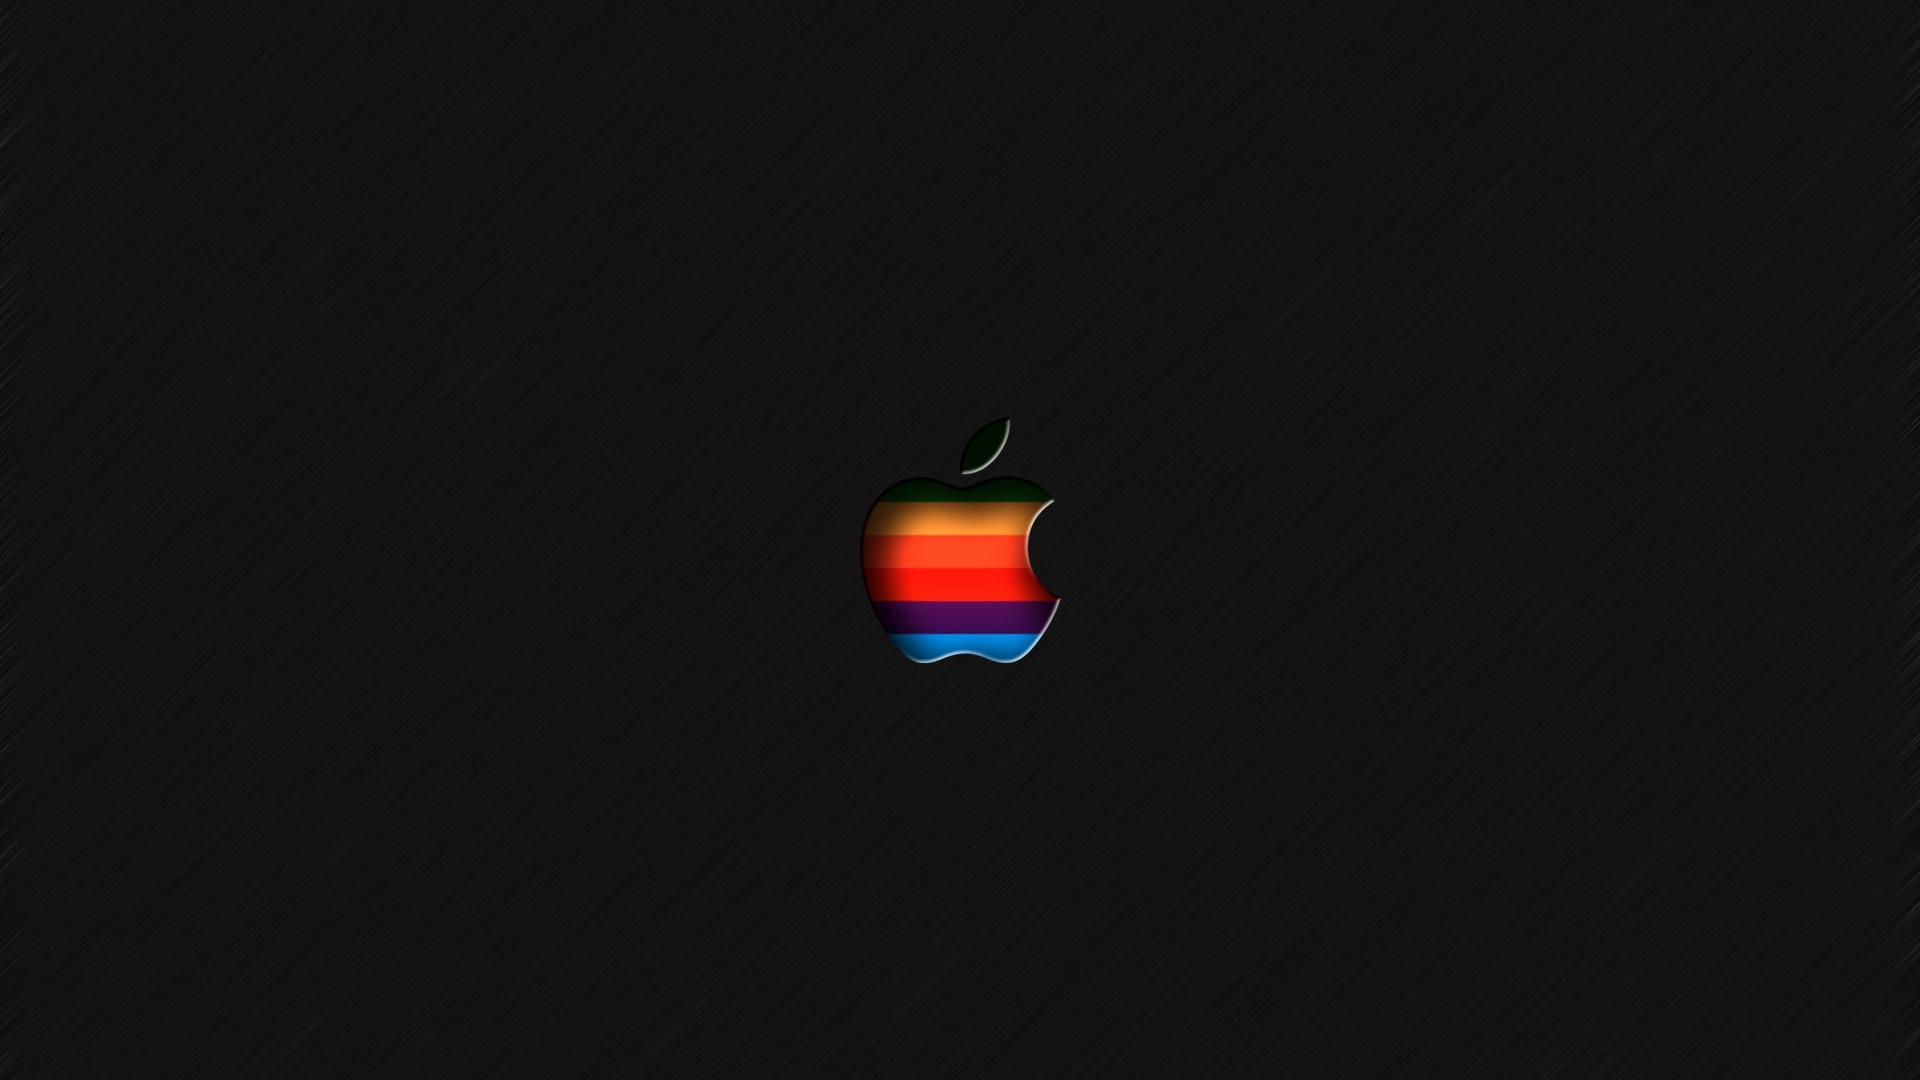 Free Download 20 Elegant Apple Mac Hd Wallpapers Set 3 Wallpapers Images, Photos, Reviews